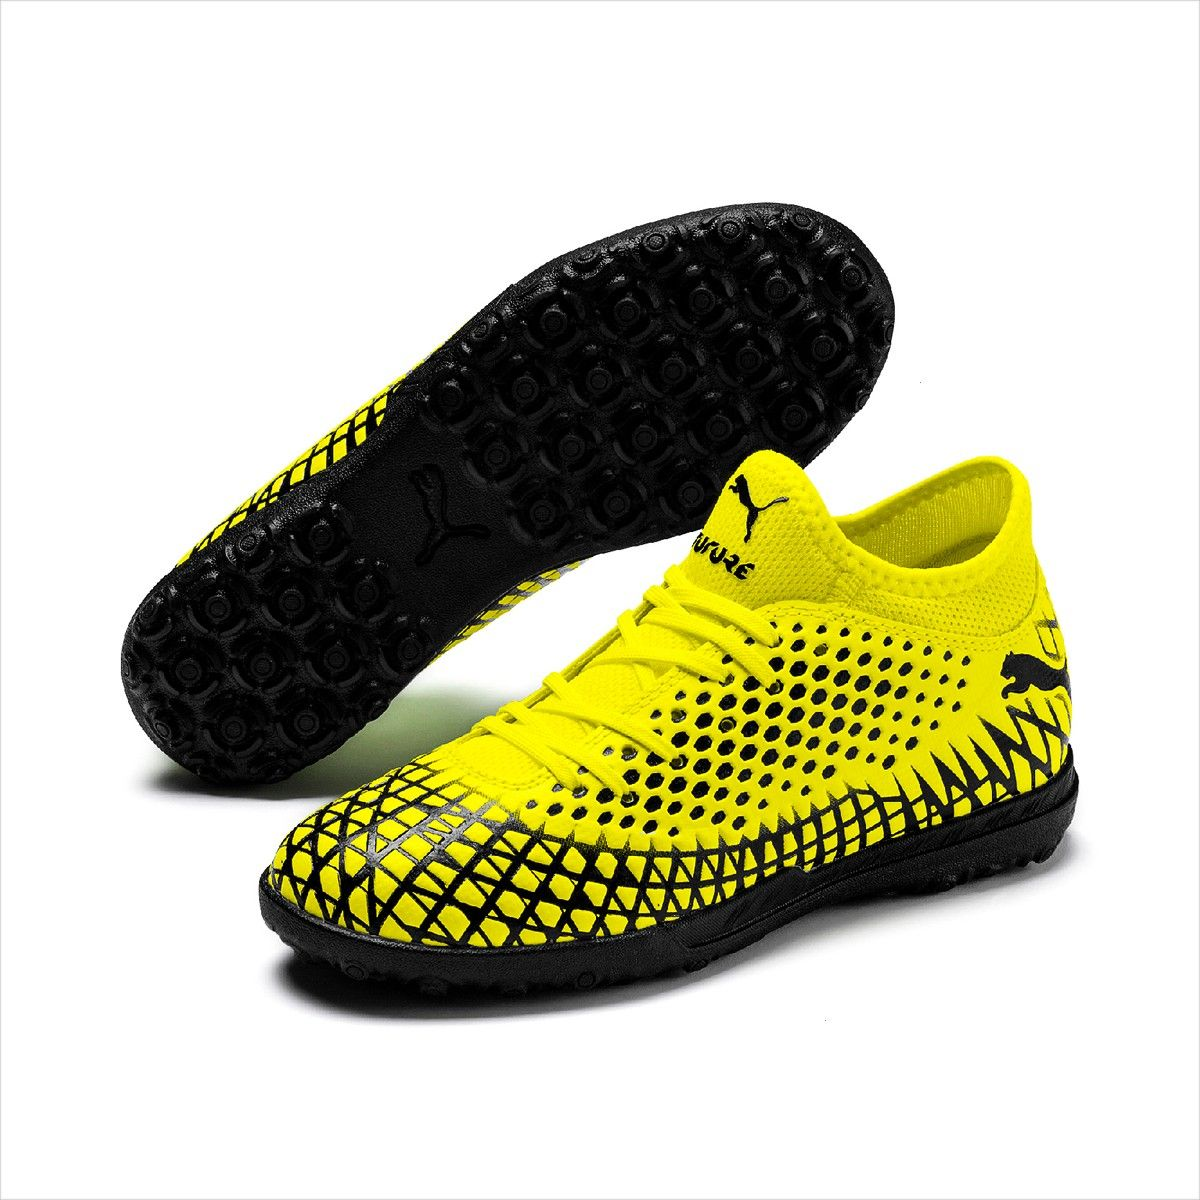 FUTURE 44 TT Junior Artificial Turf Soccer Shoe Yellow AlertBlack2PUMA FUTURE 44 TT Junior Artificial Turf Soccer Shoe Yellow AlertBlack2 George Cleverley  Anthony Pebble...